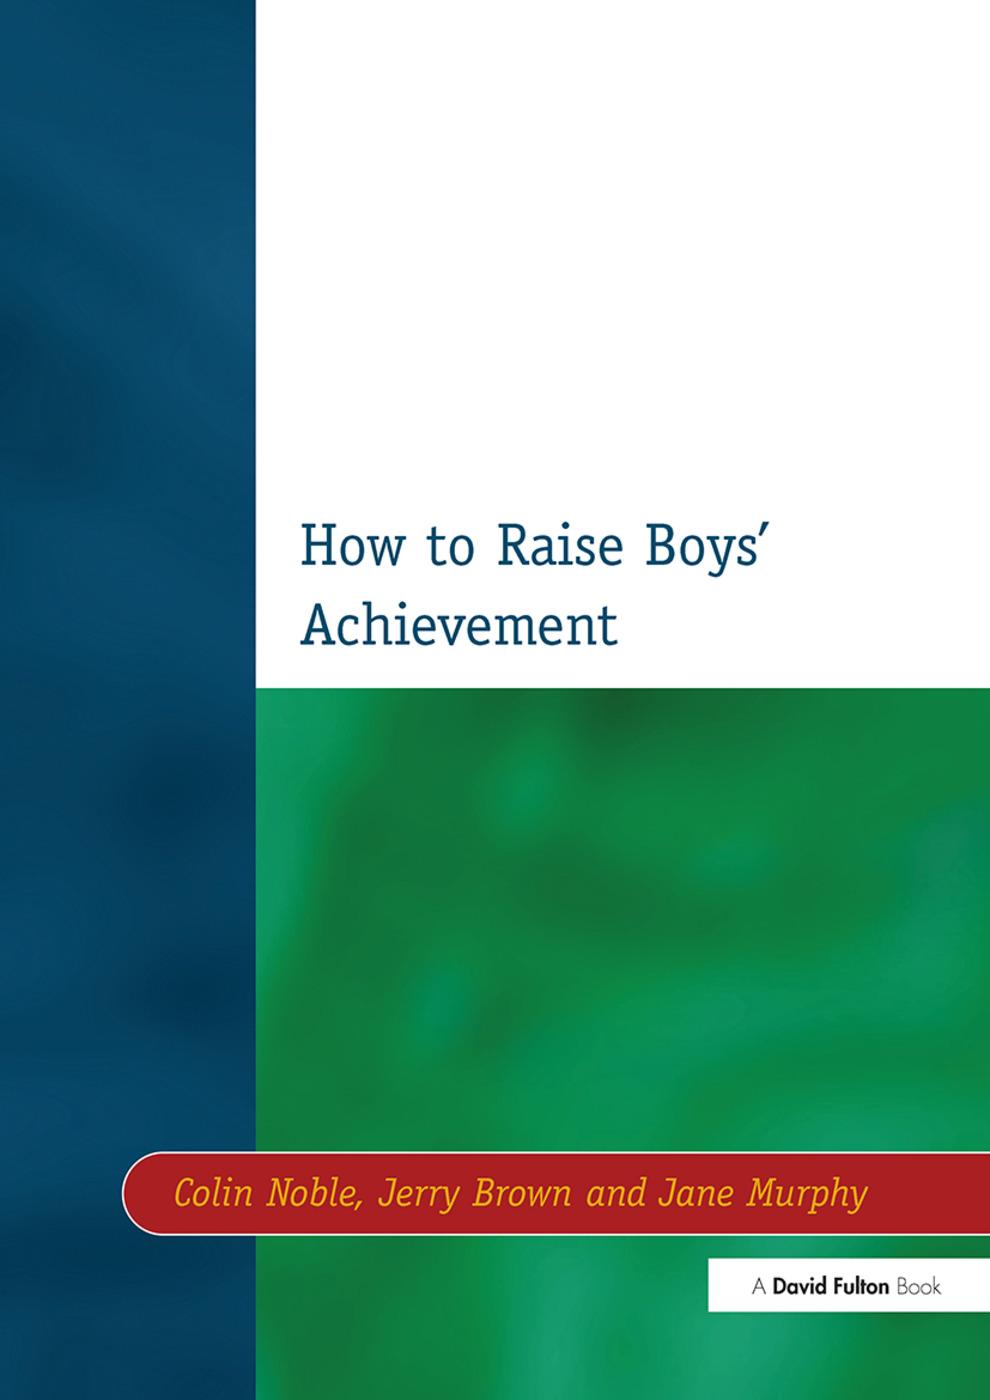 How to Raise Boys' Achievement